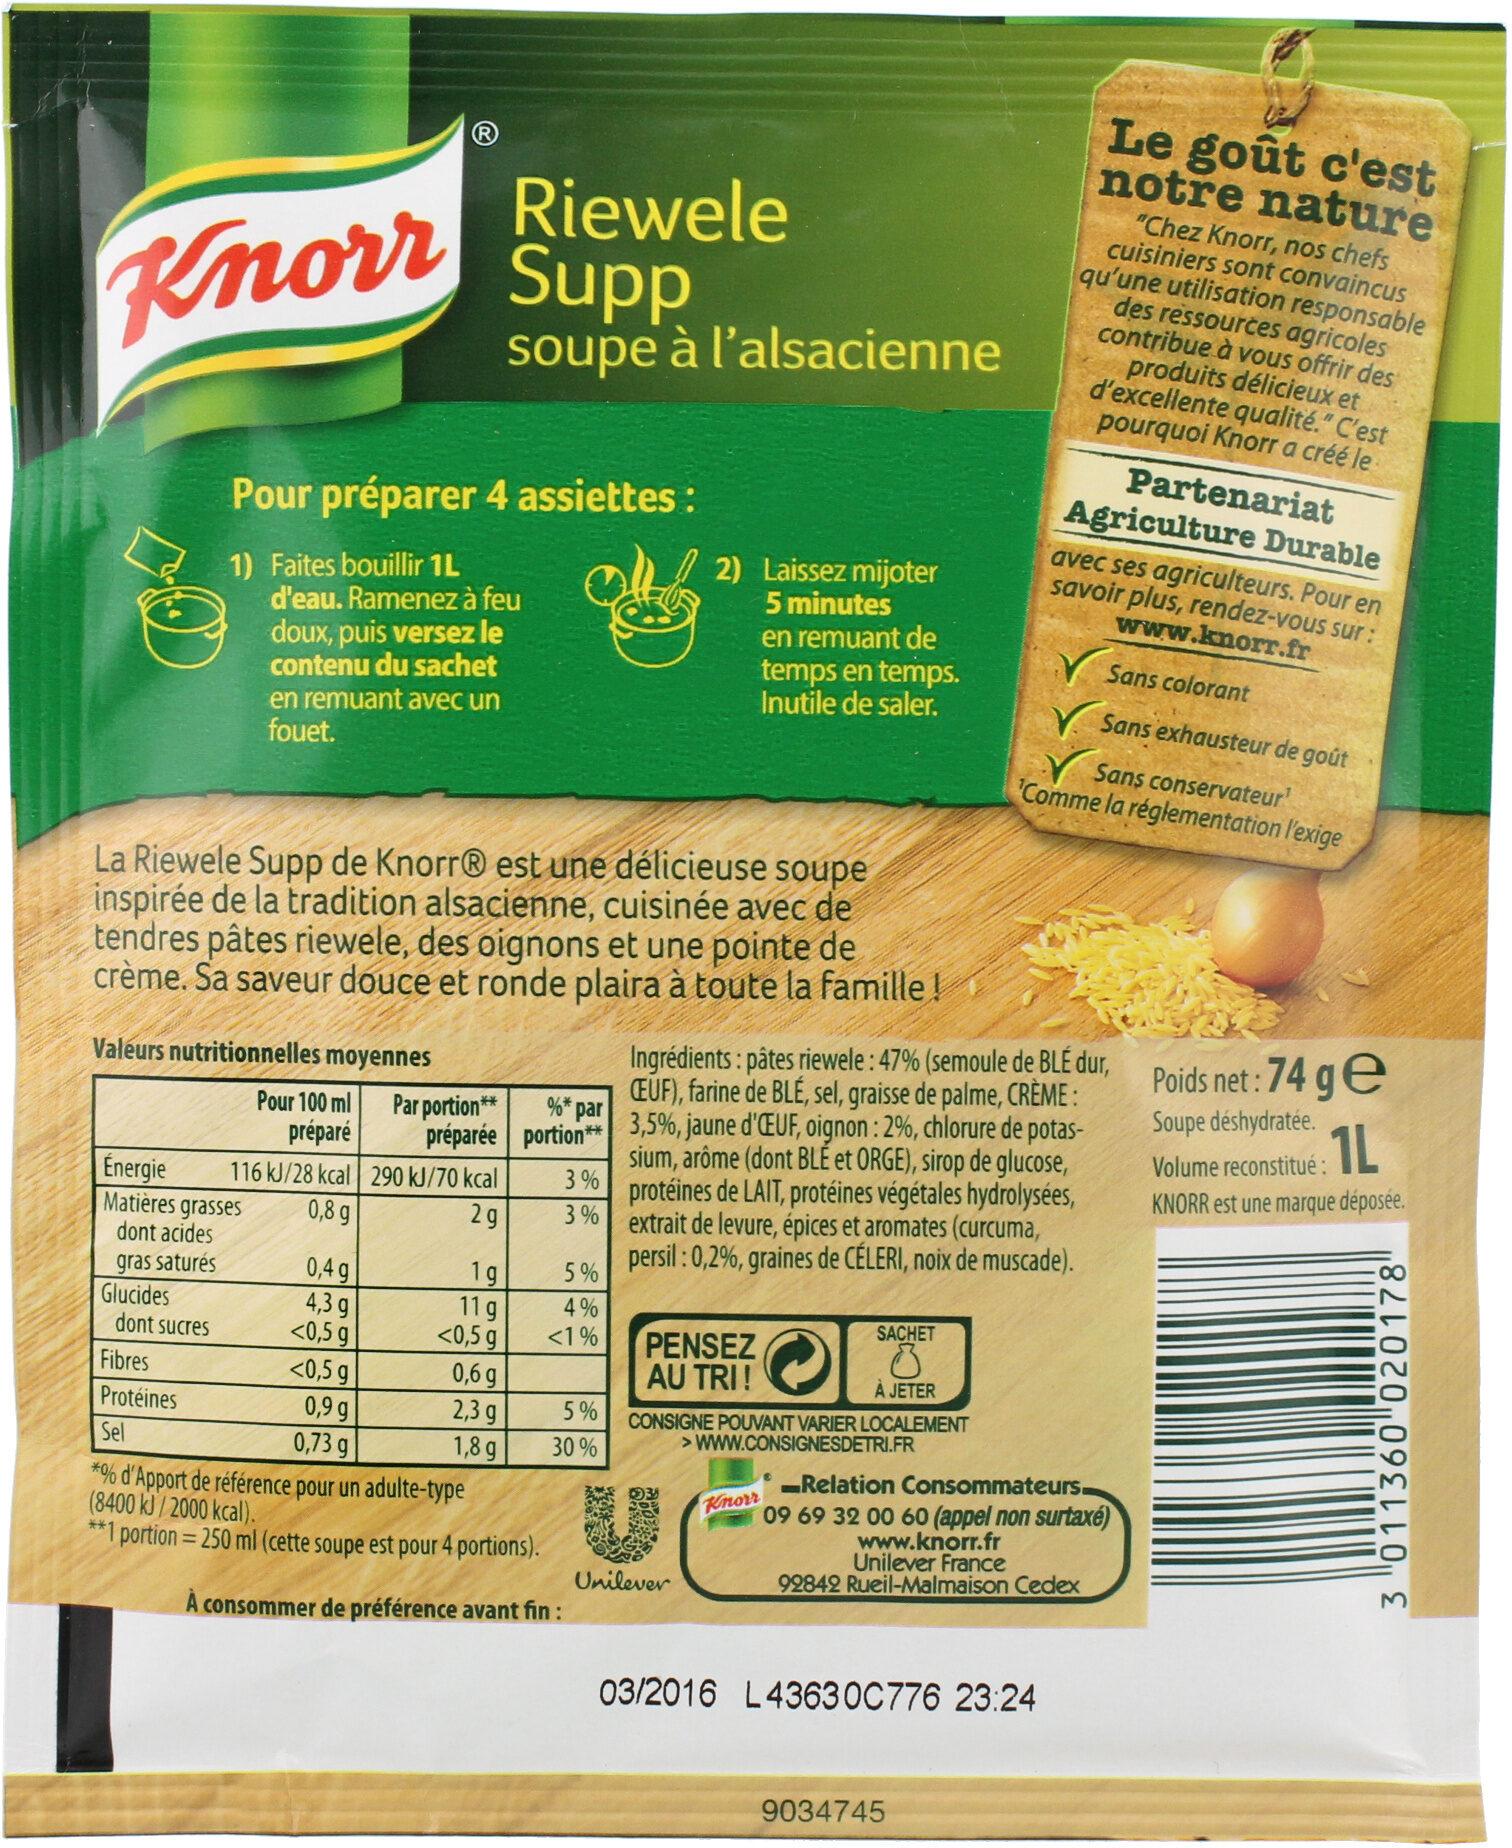 Knorr Soupe À L'Alsacienne Riewele Supp 74g 4 Portions - Voedingswaarden - fr